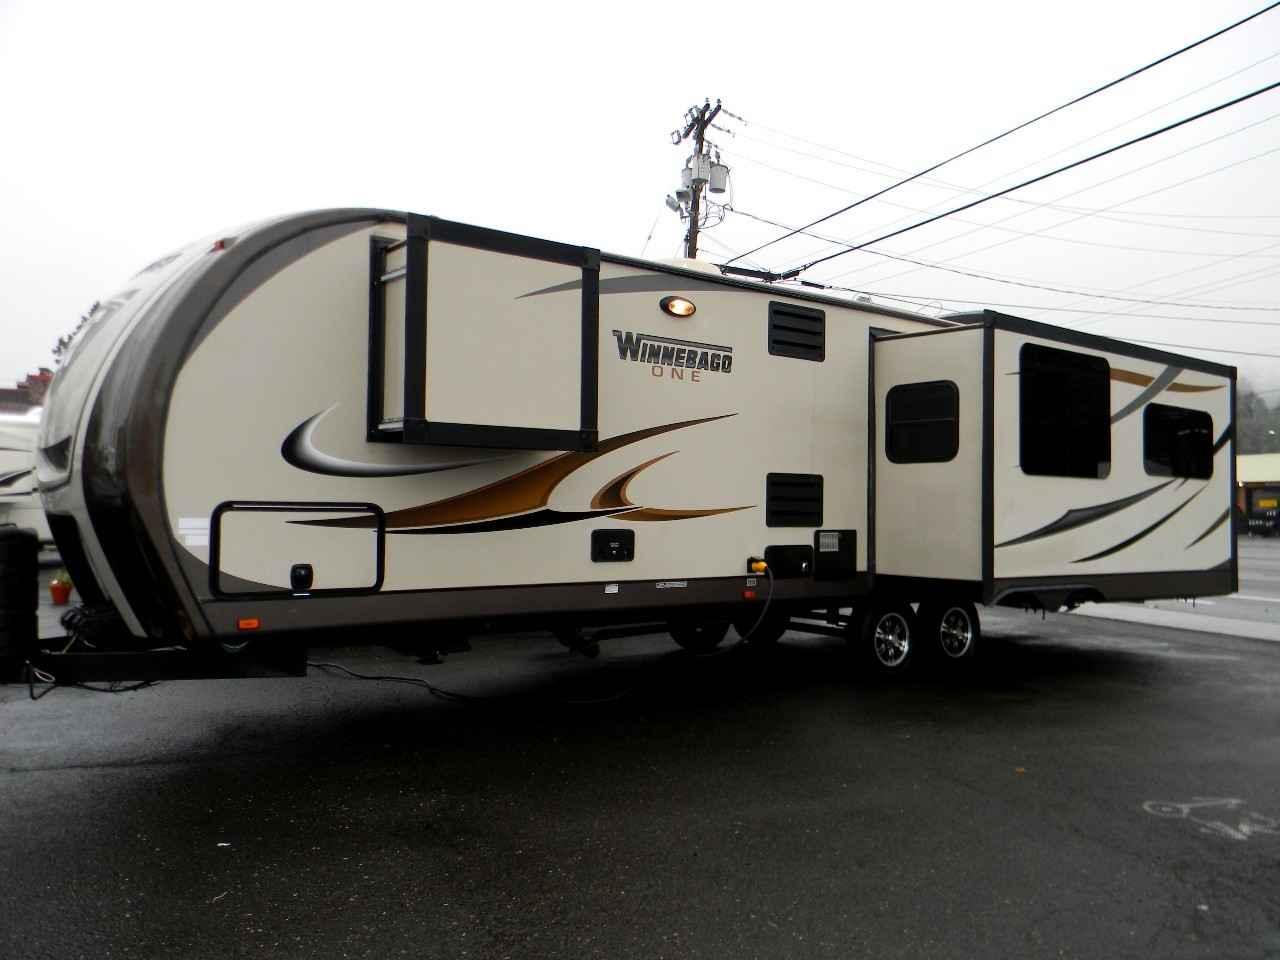 2014 Used Winnebago One Travel Trailer In Washington Wa